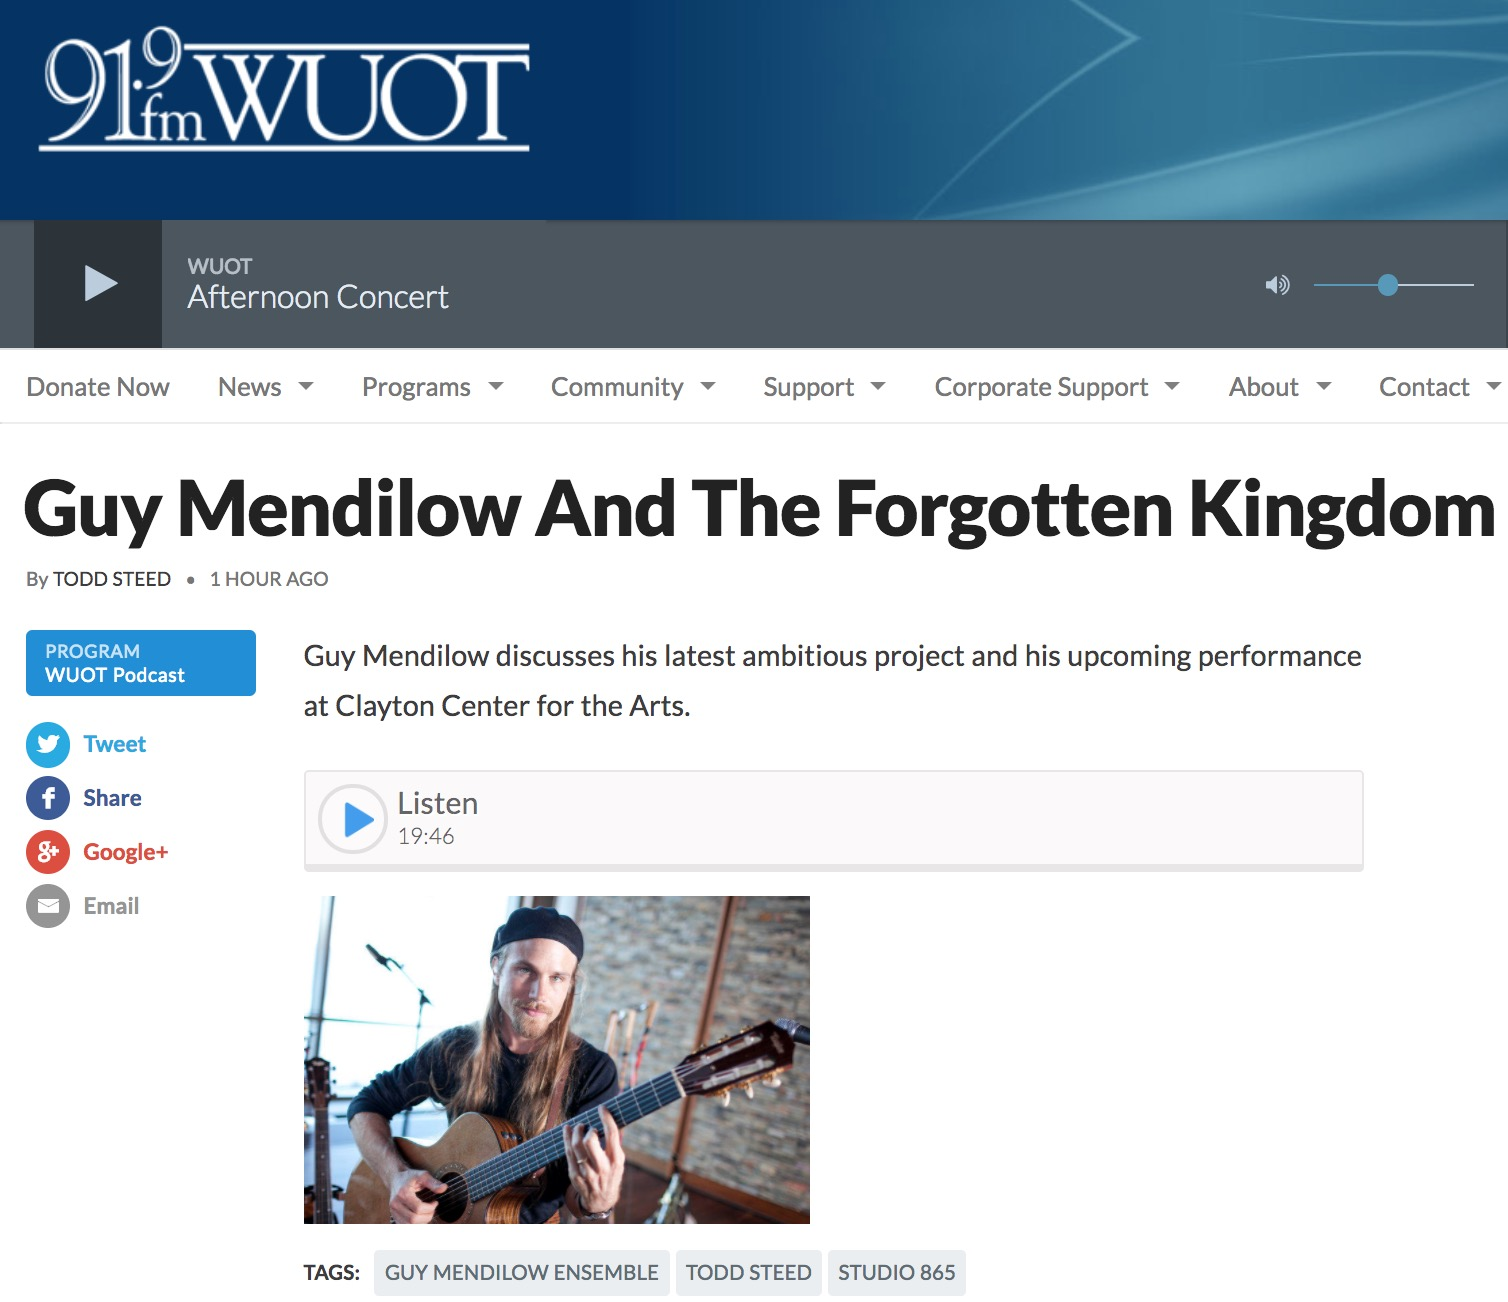 WUOT Todd Steed - Guy Mendilow